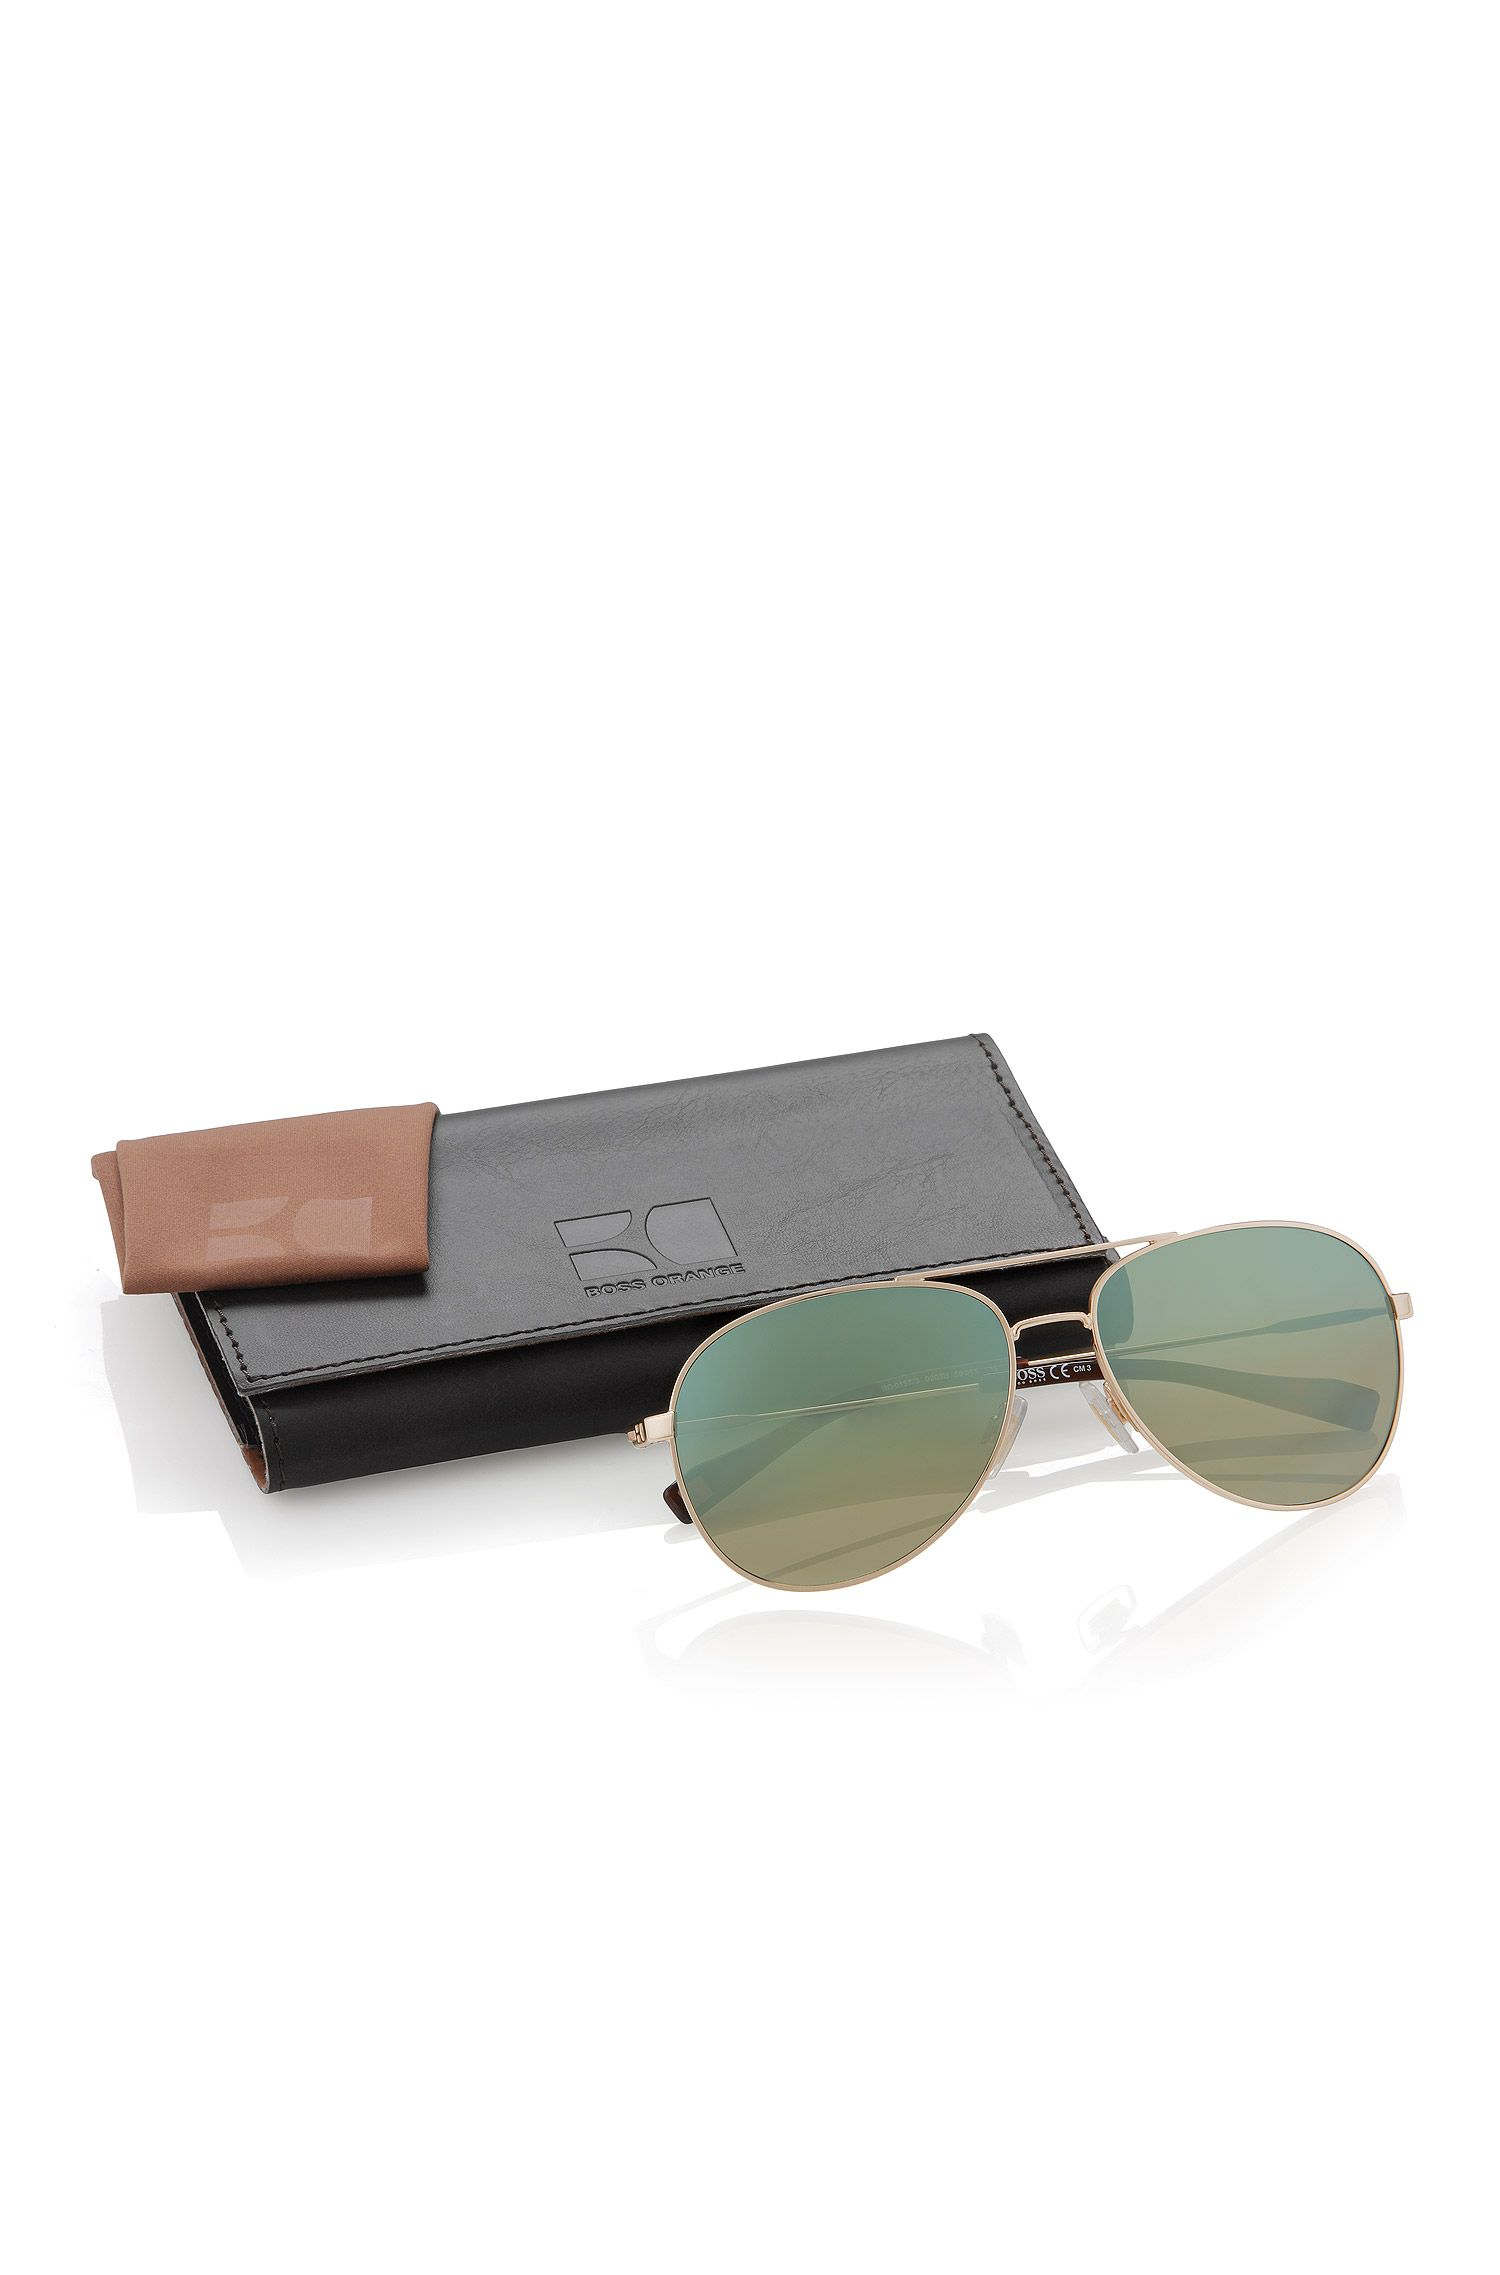 Sonnenbrille ´BO 0157/S` in Gold-Optik